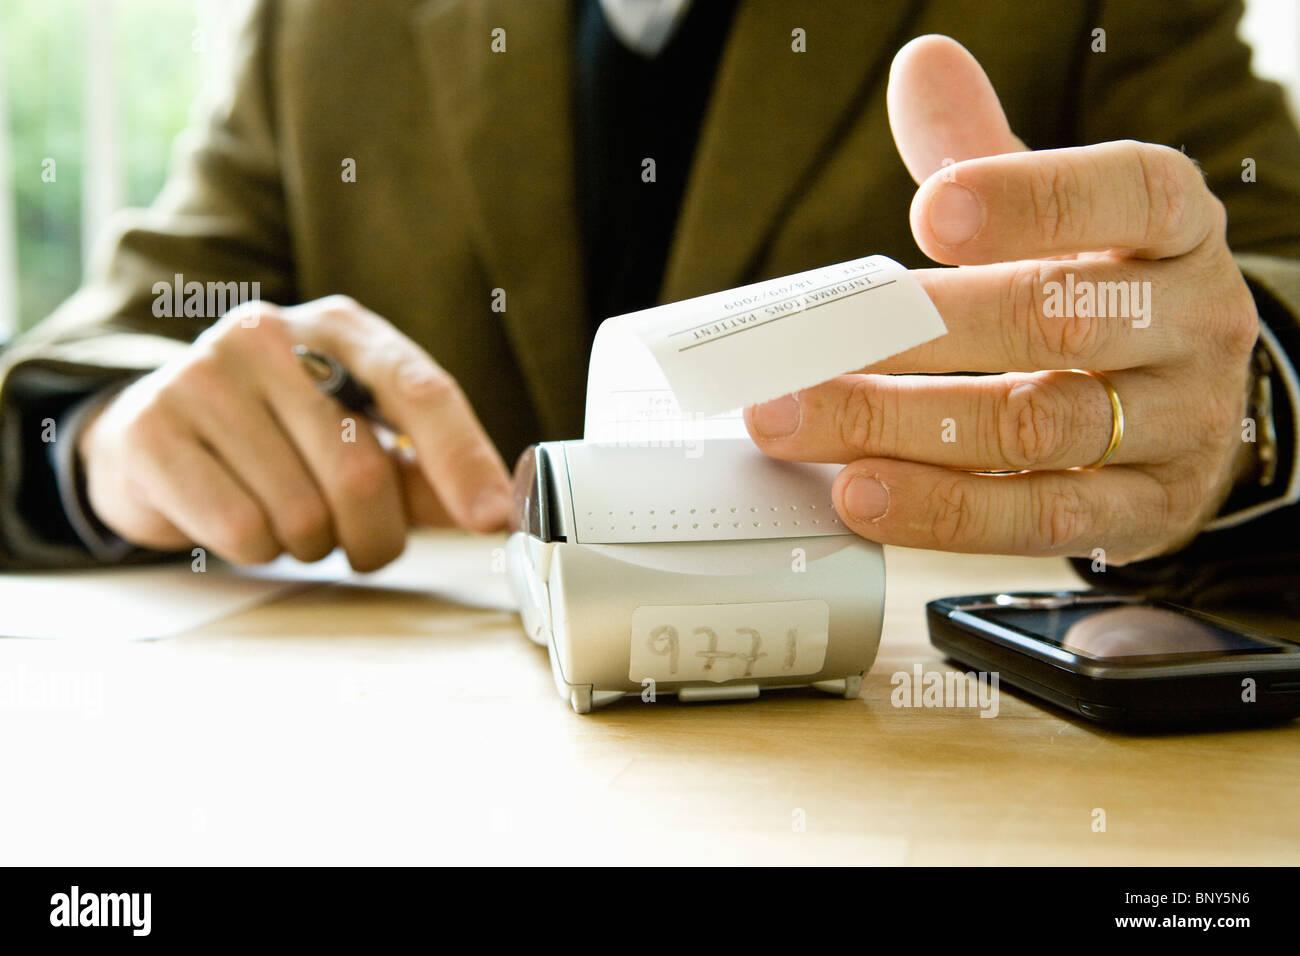 Calculating expenses using adding machine - Stock Image